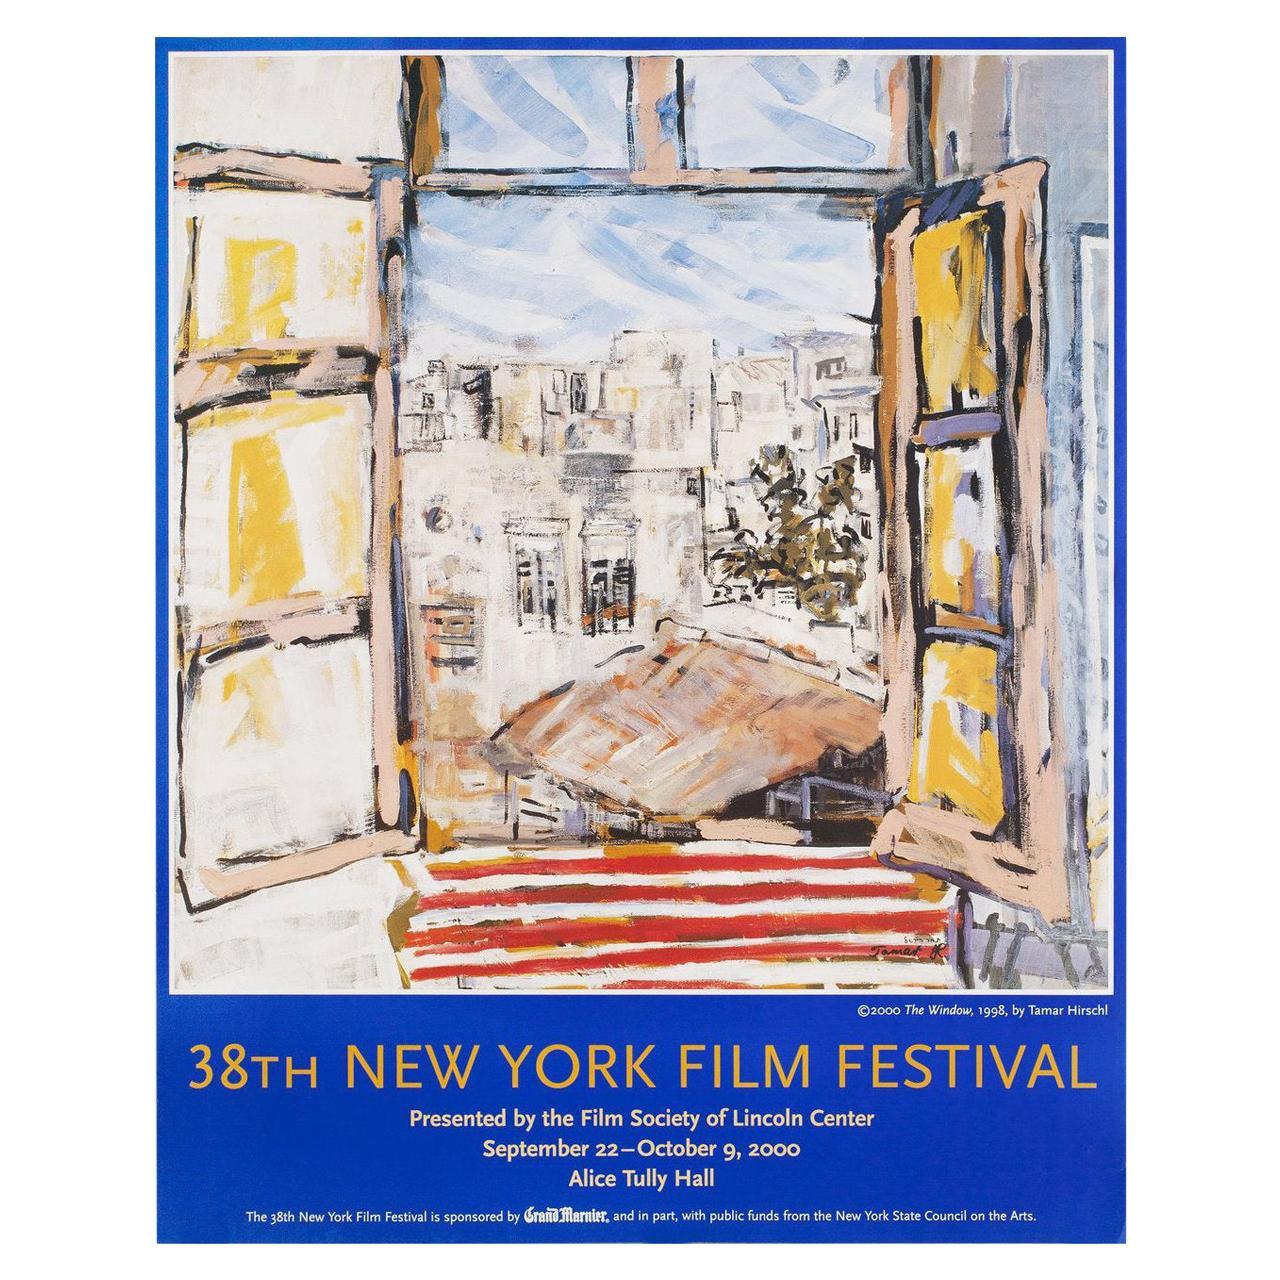 """38th New York Film Festival"" 2000 U.S. Poster"